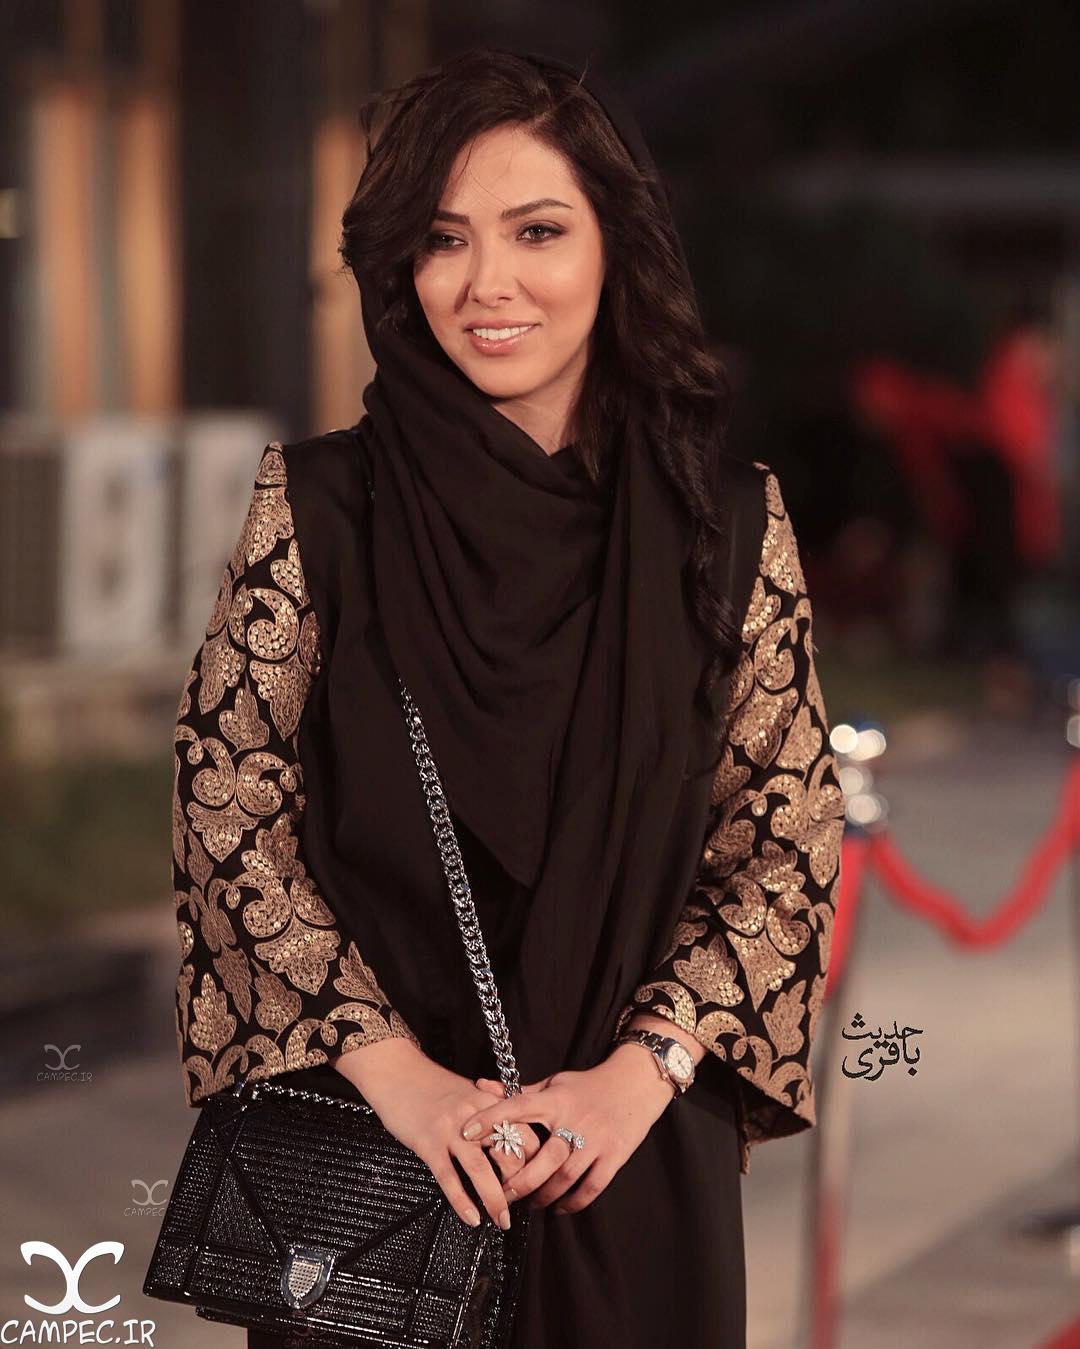 لیلا اوتادی بر روی فرش قرمز جشن حافظ